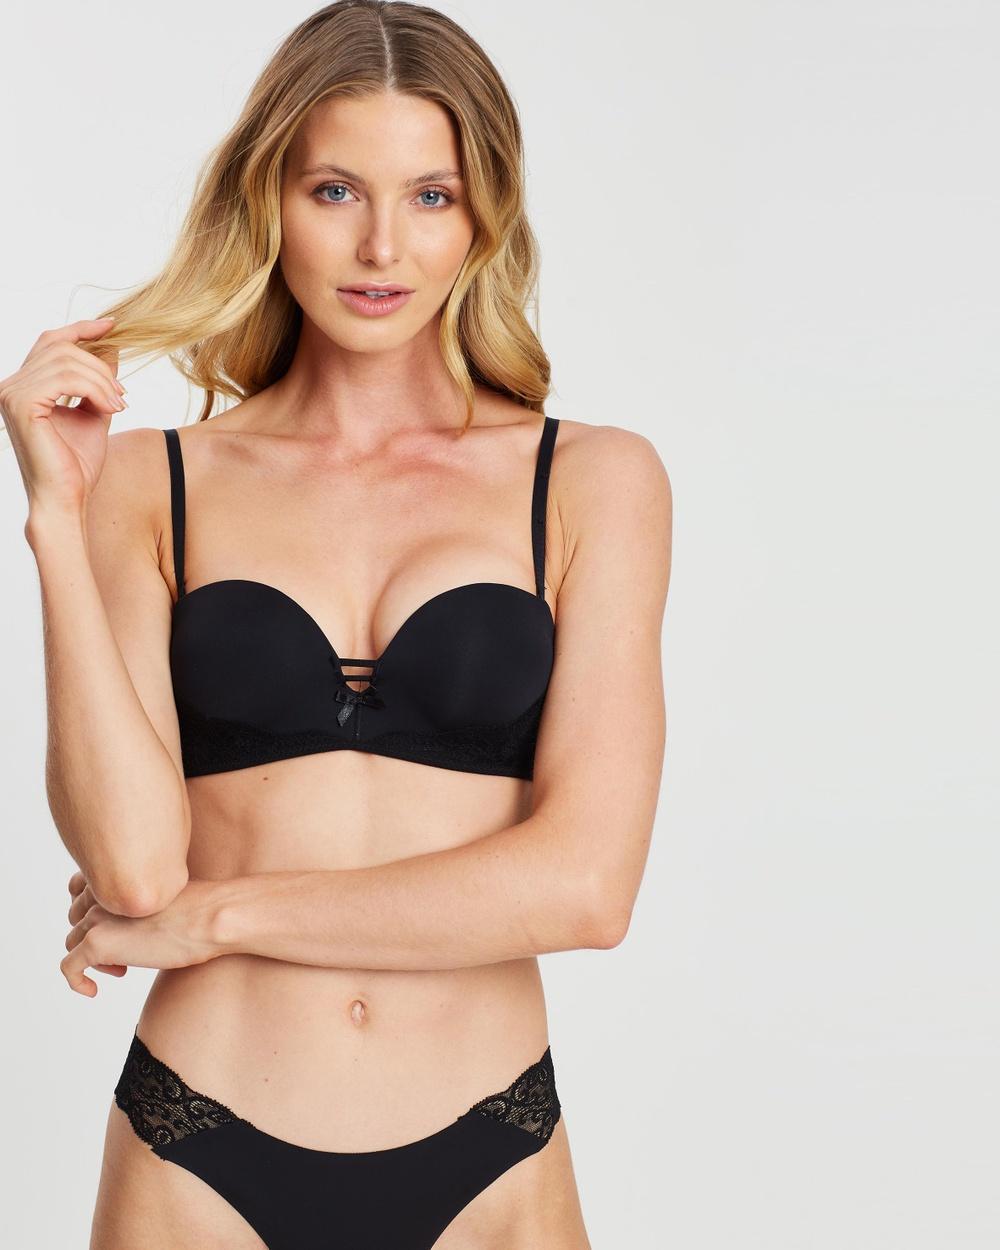 Cotton On Body Sophia Lace Strapless Push Up 2 Bra Underwear & Sleepwear Black Push-Up